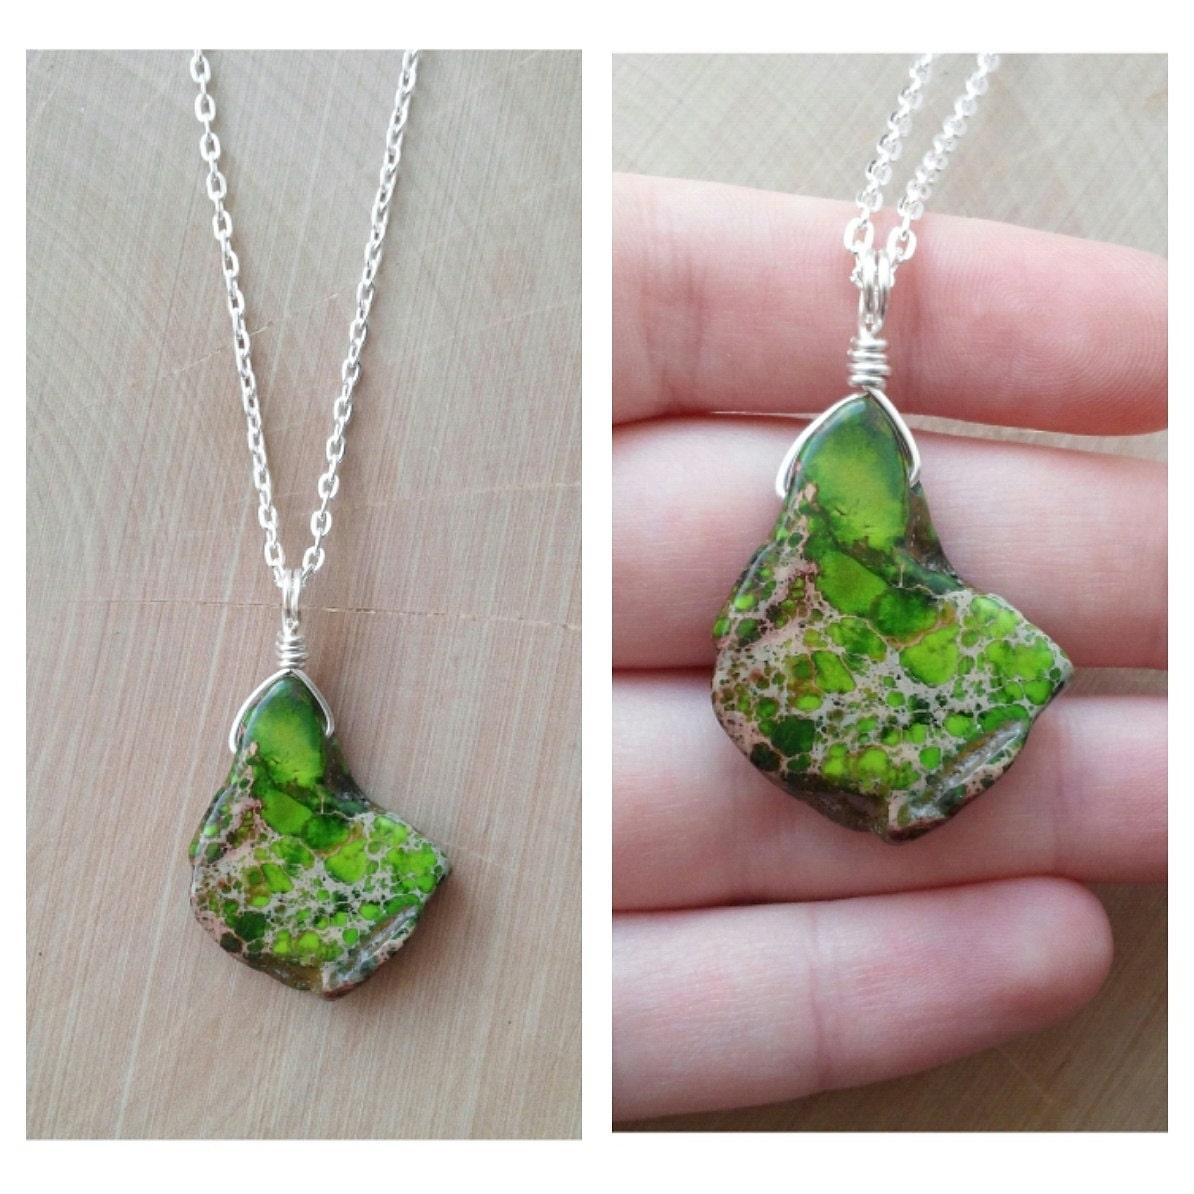 Verde Imperial Jasper Necklace By Drunkenmermaid On Etsy